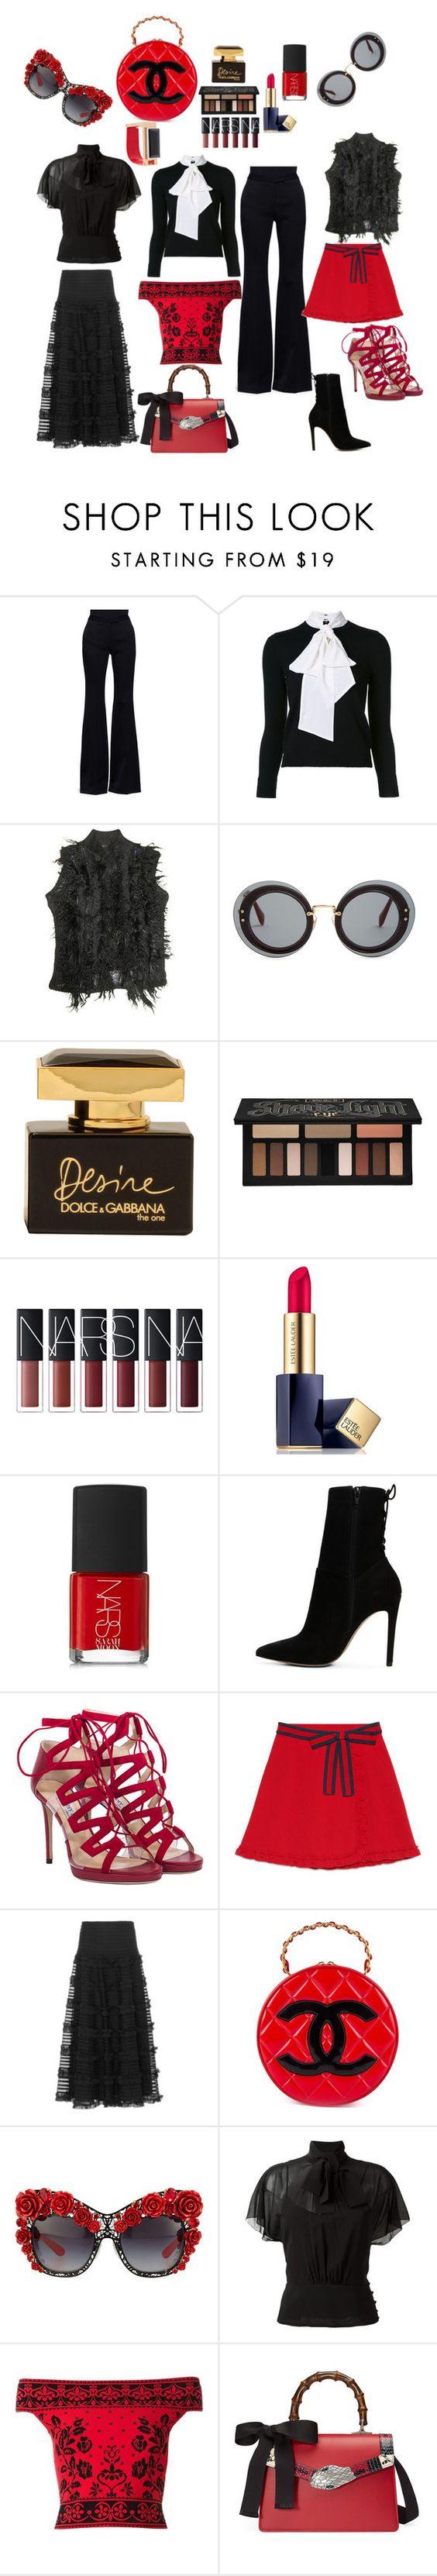 """💋"" by artisans ❤ liked on Polyvore featuring Alexander McQueen, Alice + Olivia, Plein Sud, Miu Miu, Dolce&Gabbana, Kat Von D, Estée Lauder, NARS Cosmetics, ALDO and Jimmy Choo"